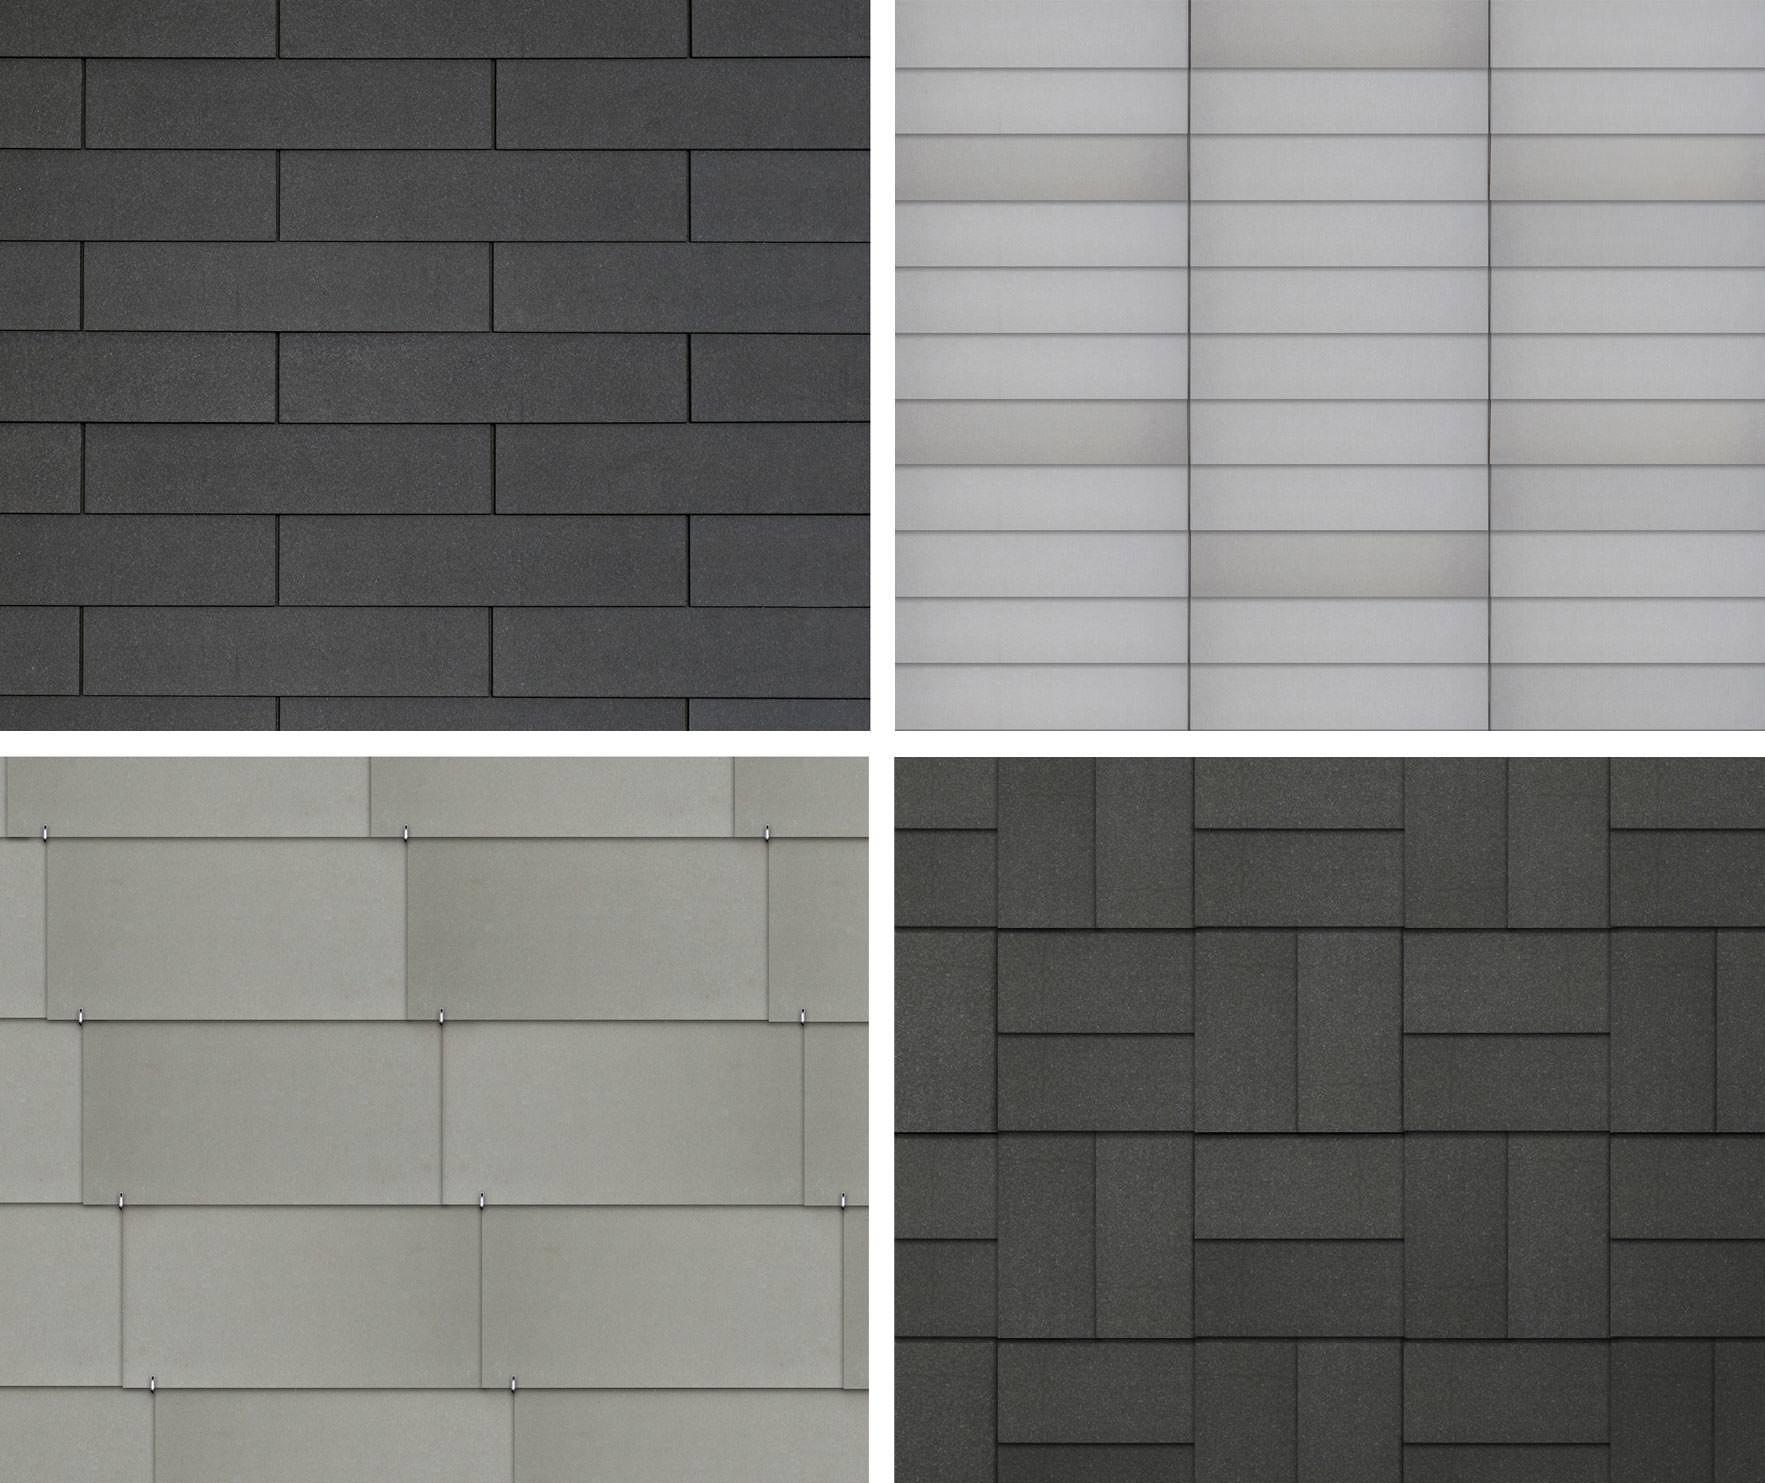 eternit natura gro format klassiker auch als kleinformat. Black Bedroom Furniture Sets. Home Design Ideas